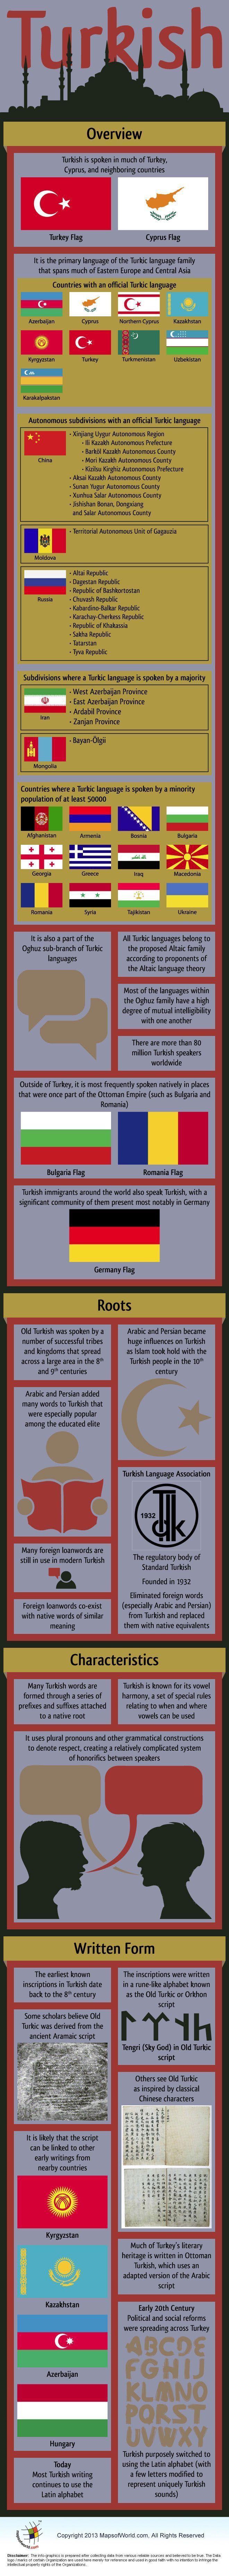 Educational infographic : Educational infographic : Infographic on Turkish Language